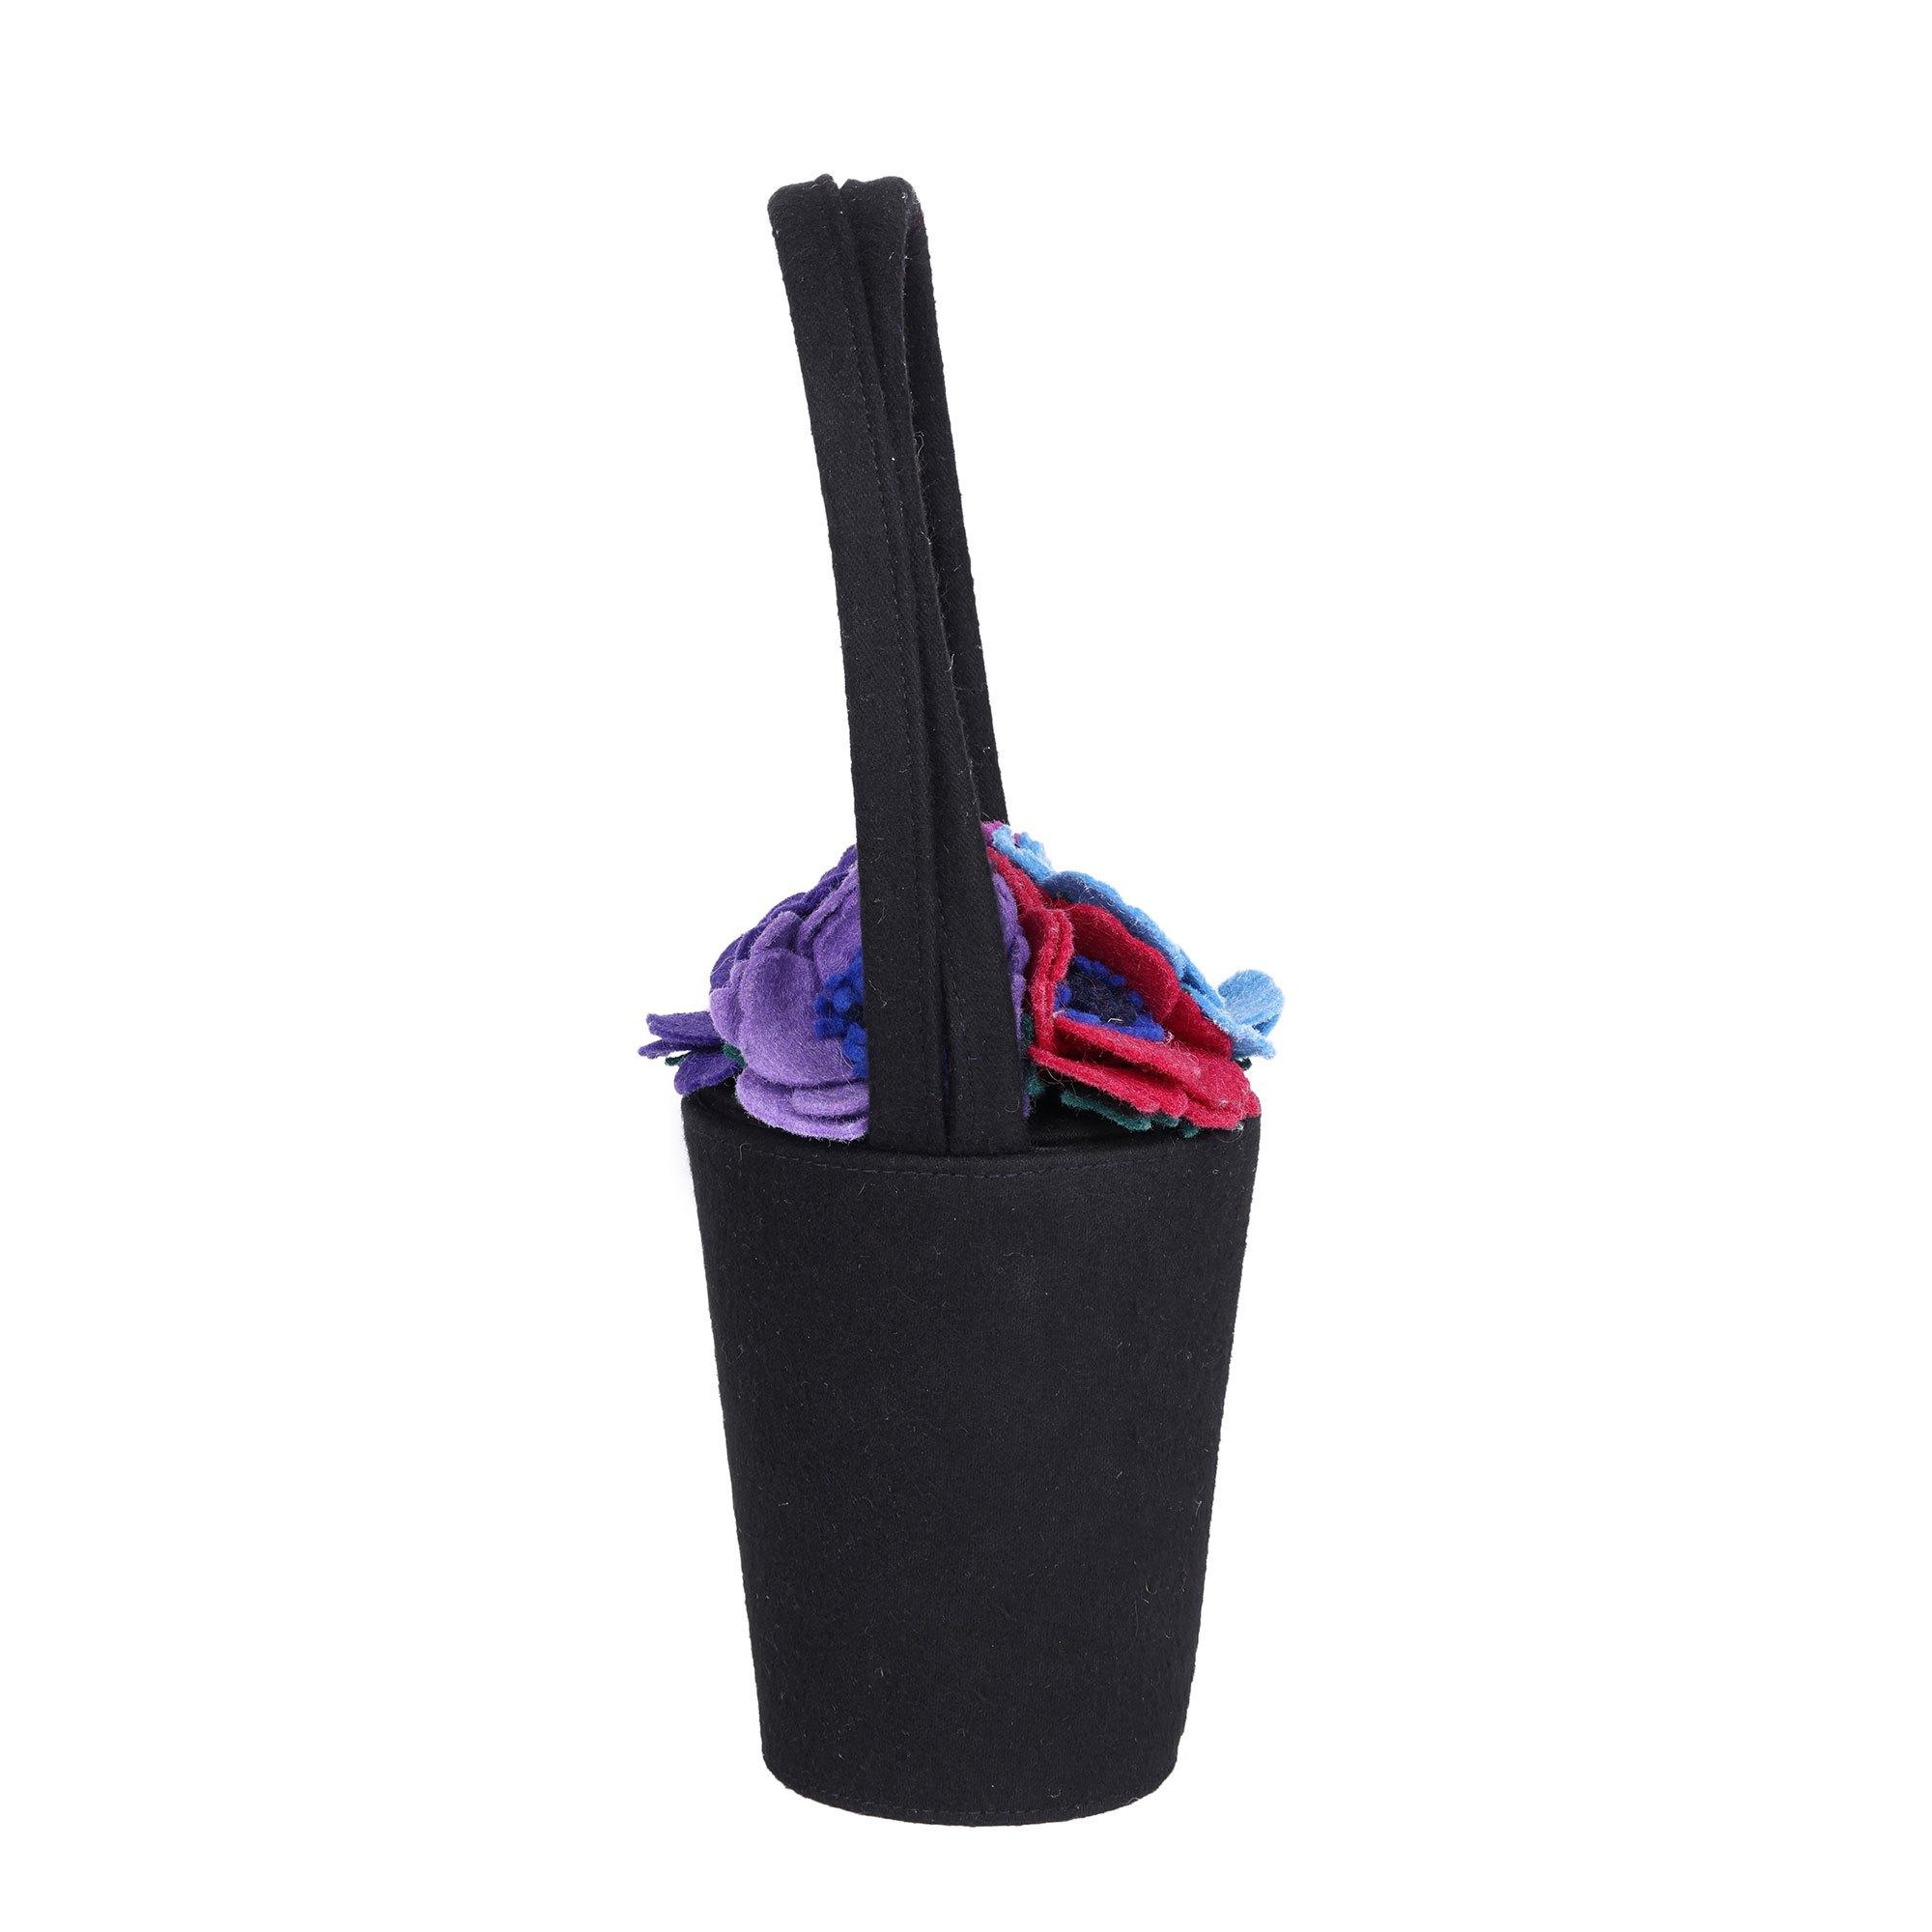 Lulu Guinness Black, Pink, Purple, Blue, Green & Red Felt Vintage Baby Florist Pot Bag